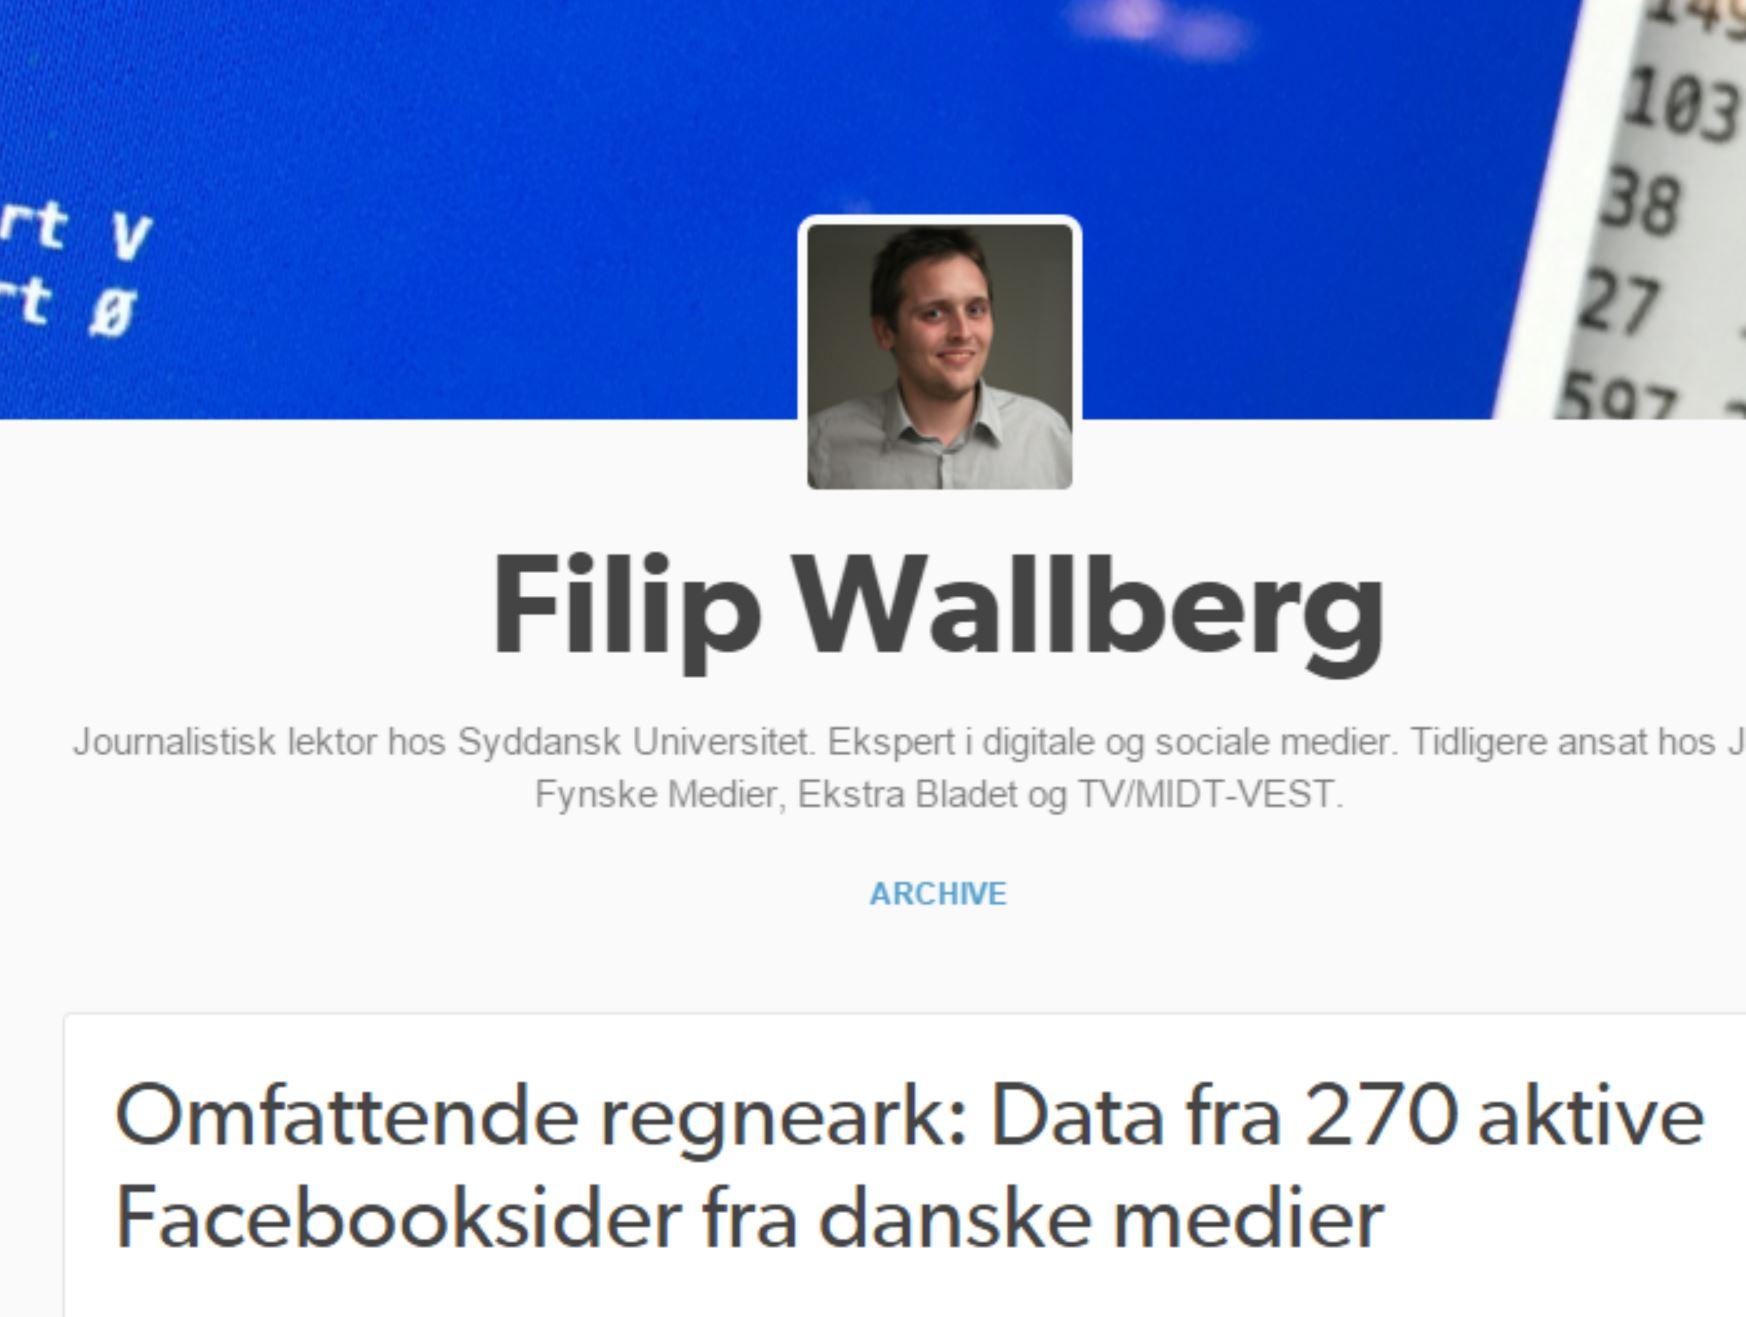 Omfattende regneark: Data fra 270 aktive Facebooksider fra danske medier